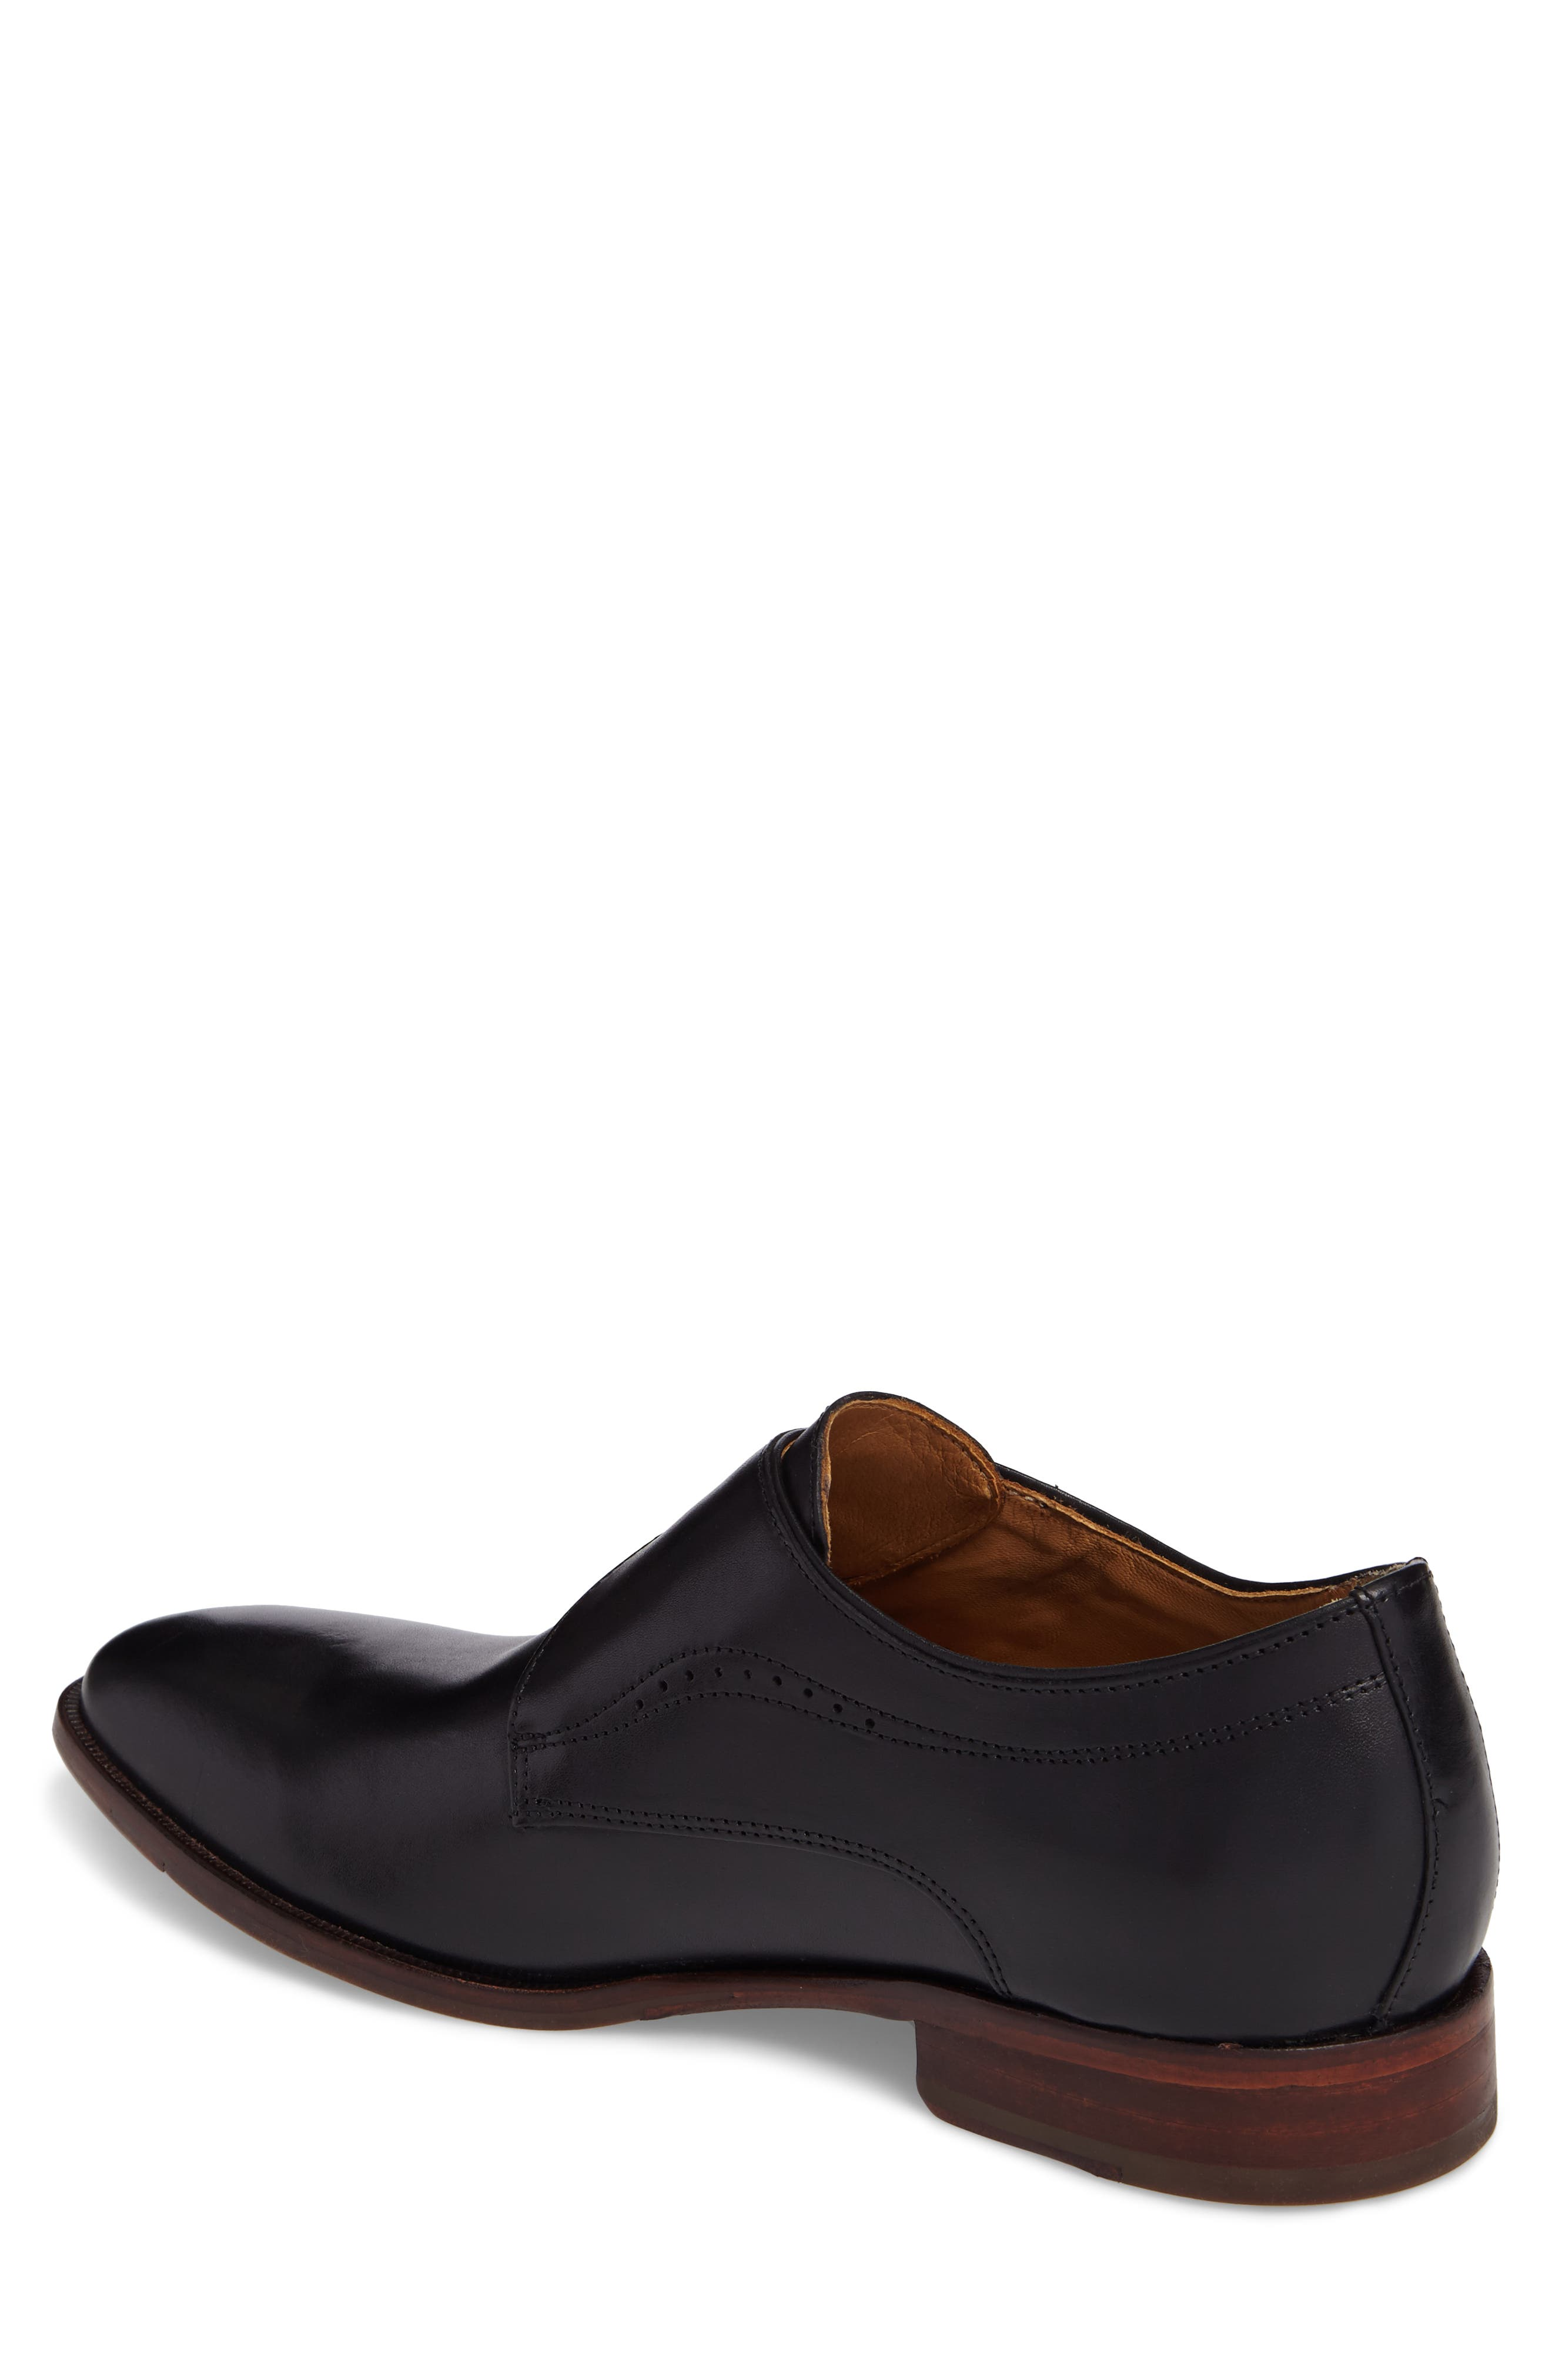 JOHNSTON & MURPHY, McClain Monk Strap Shoe, Alternate thumbnail 2, color, BLACK